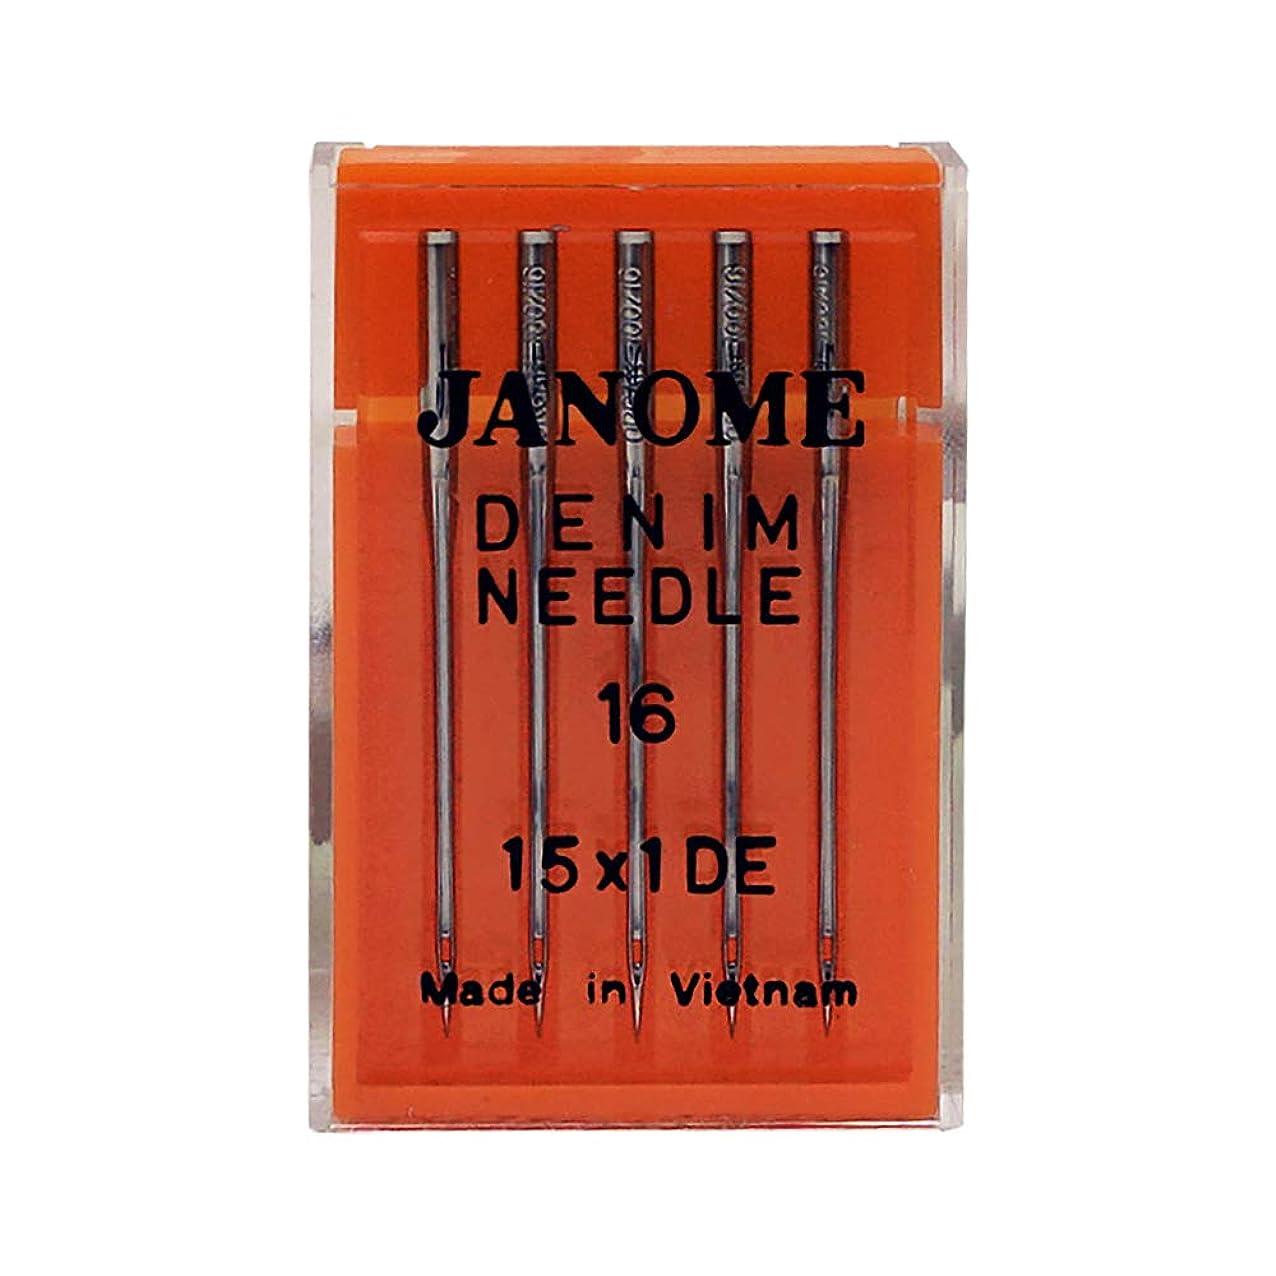 Janome Sewing Machine Needle Denim Size 16 gsplvtrzubprs154